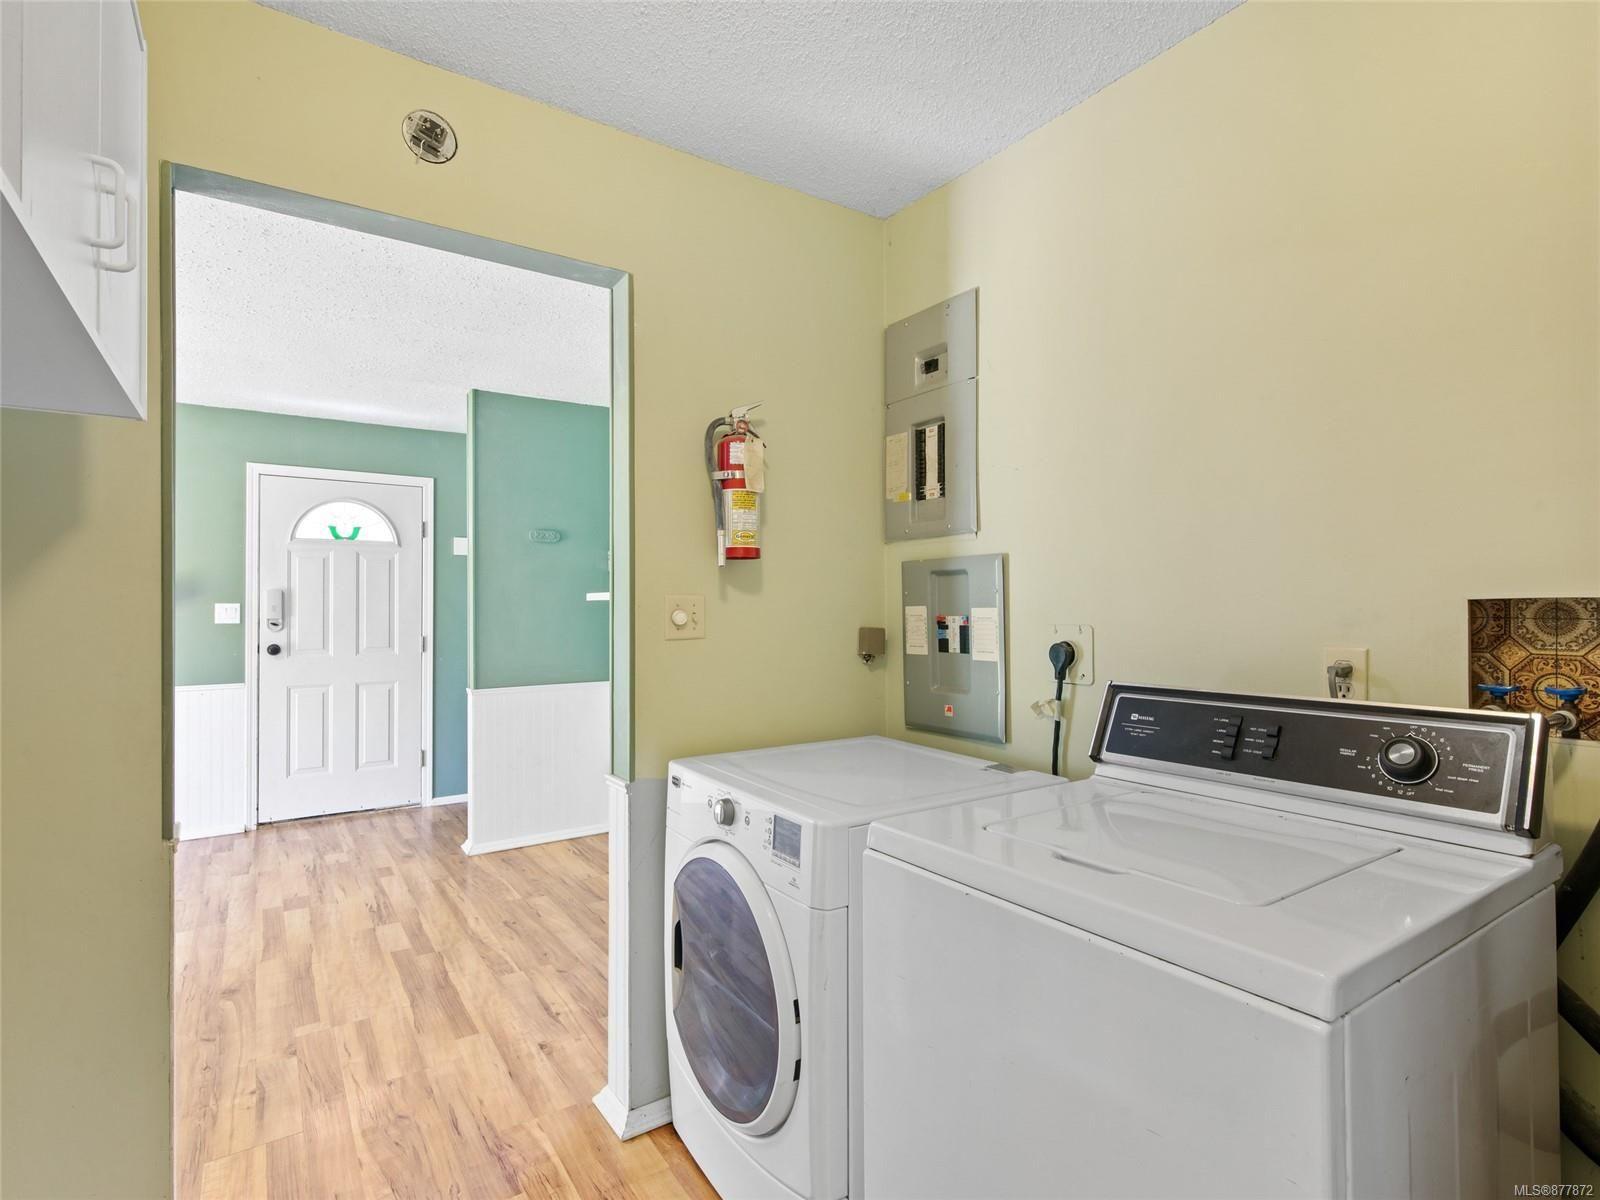 Photo 22: Photos: 7865 Wardrop Rd in : PA Port Alberni House for sale (Port Alberni)  : MLS®# 877872